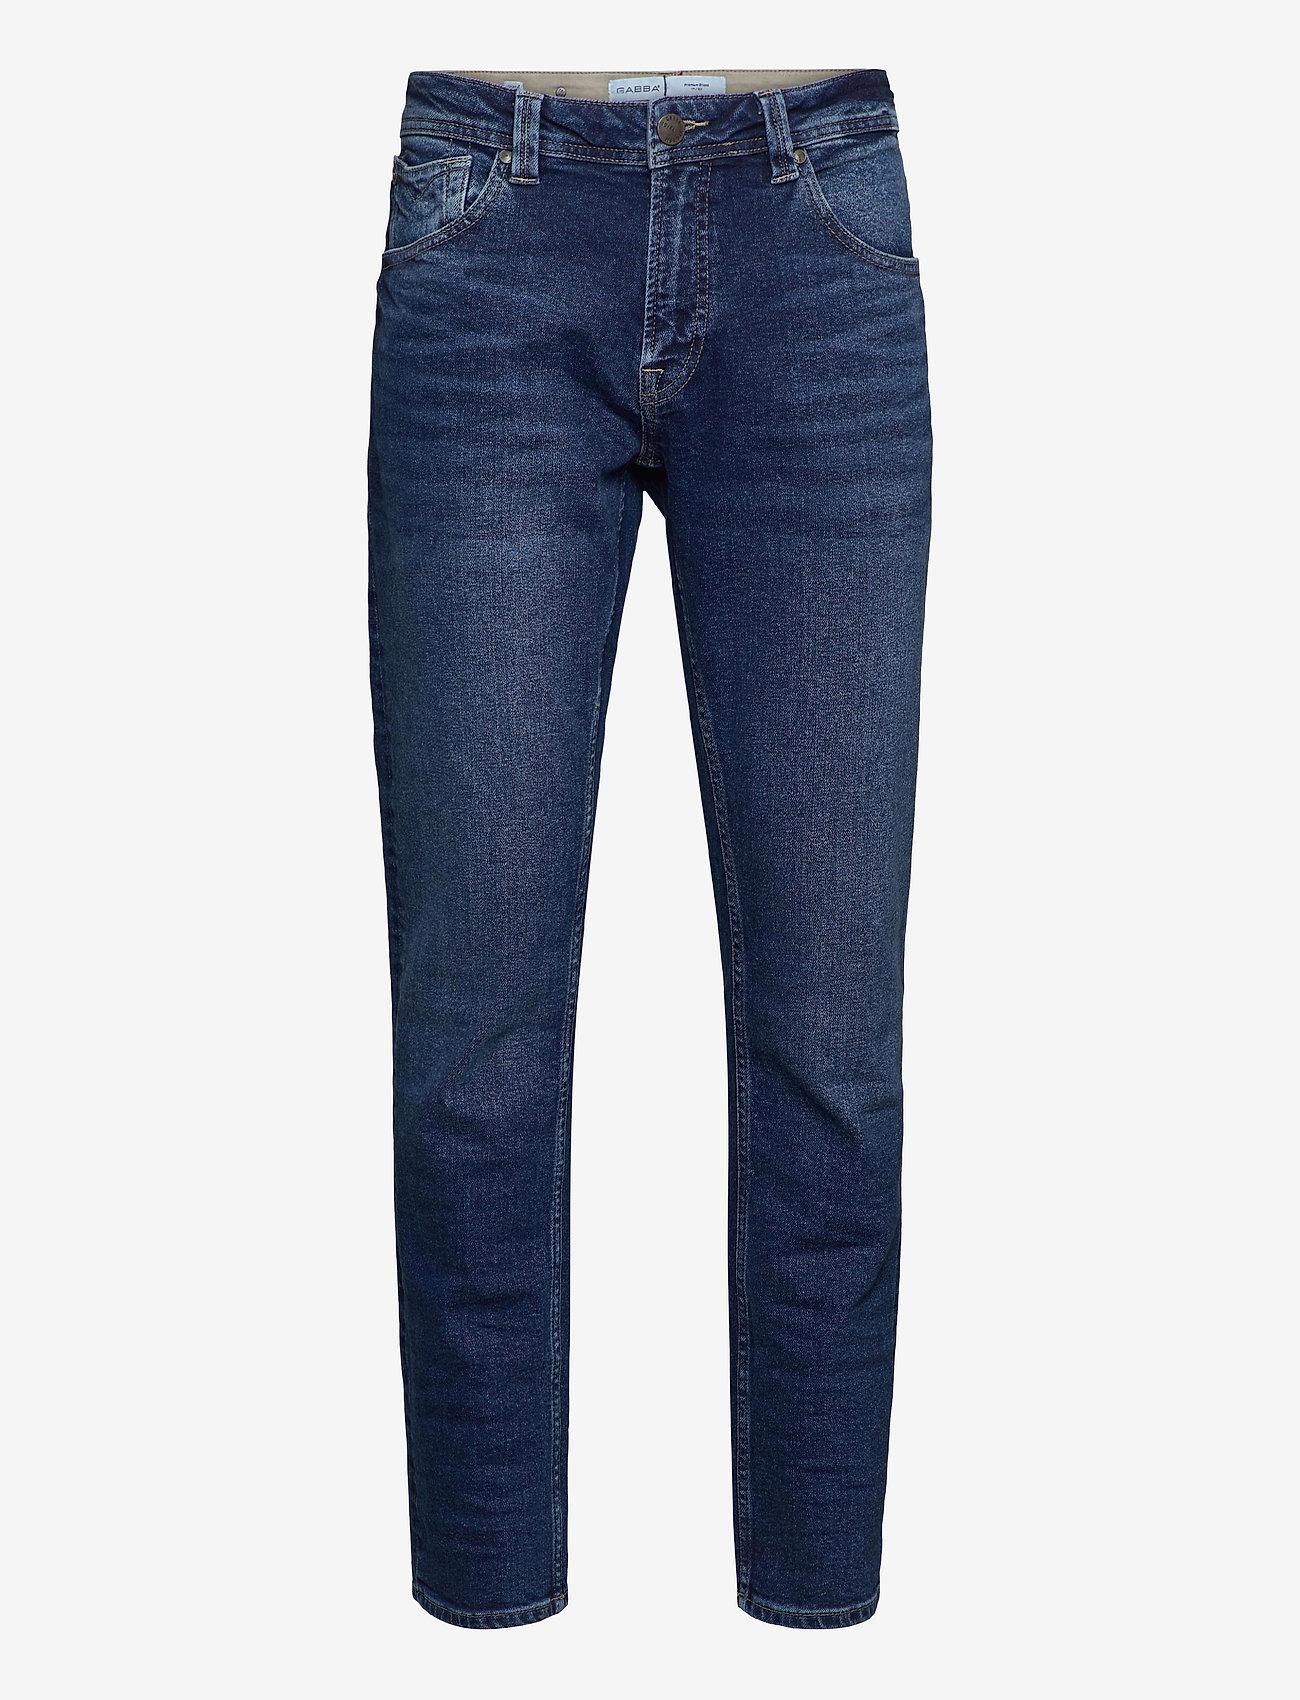 Gabba - Nico K3572 Jeans - regular jeans - rs1380 - 0